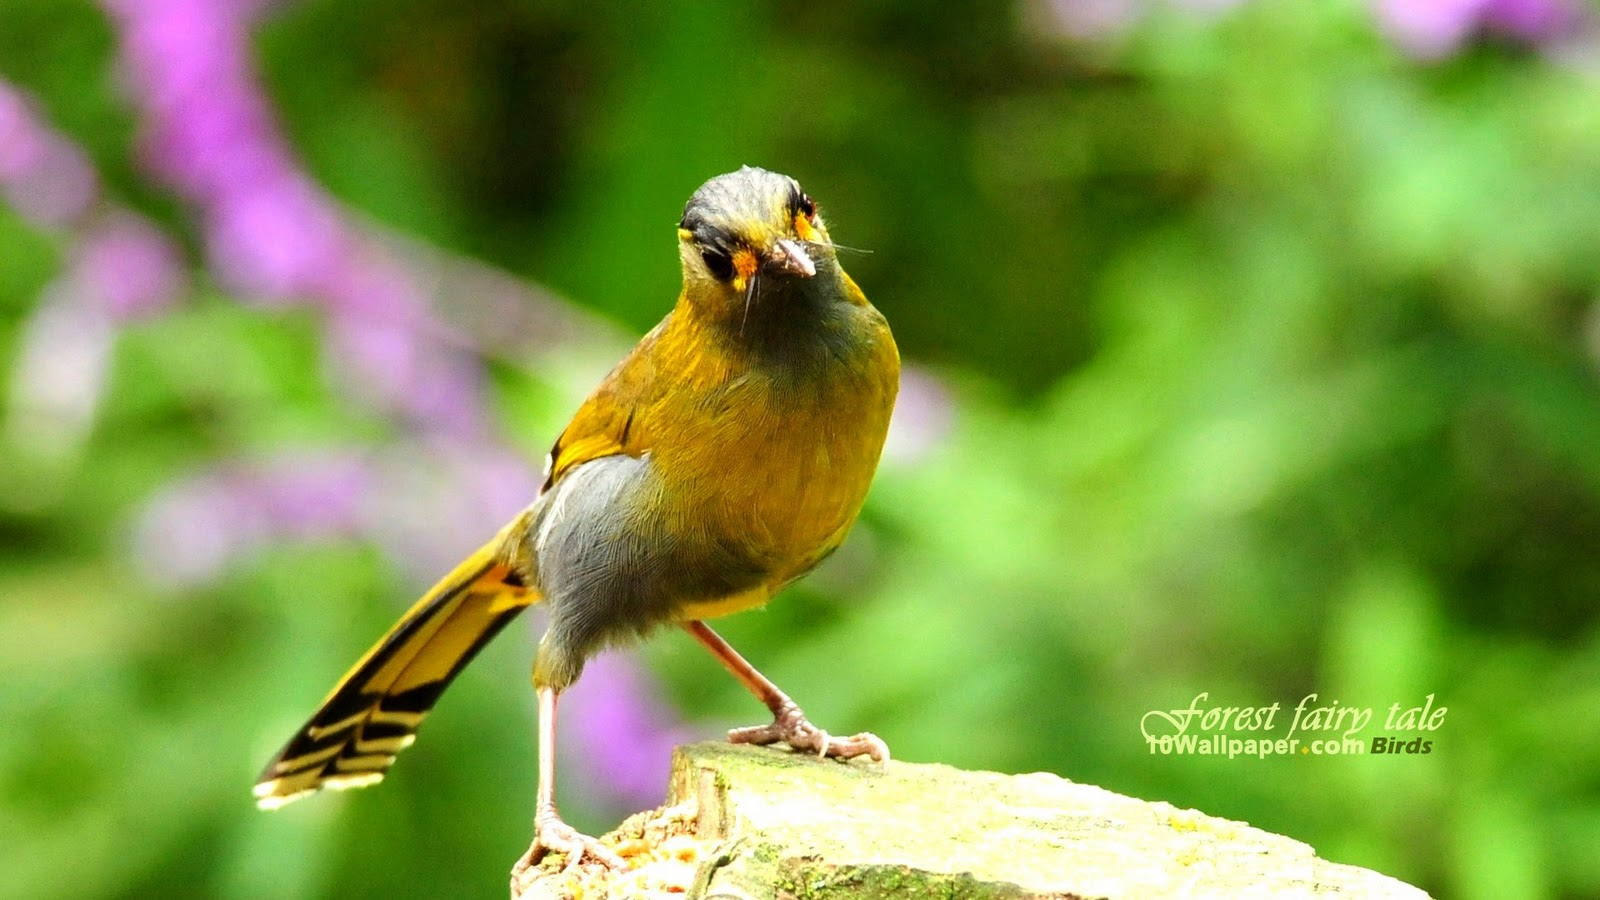 Dawn Of Battle: YELLOW BIRD